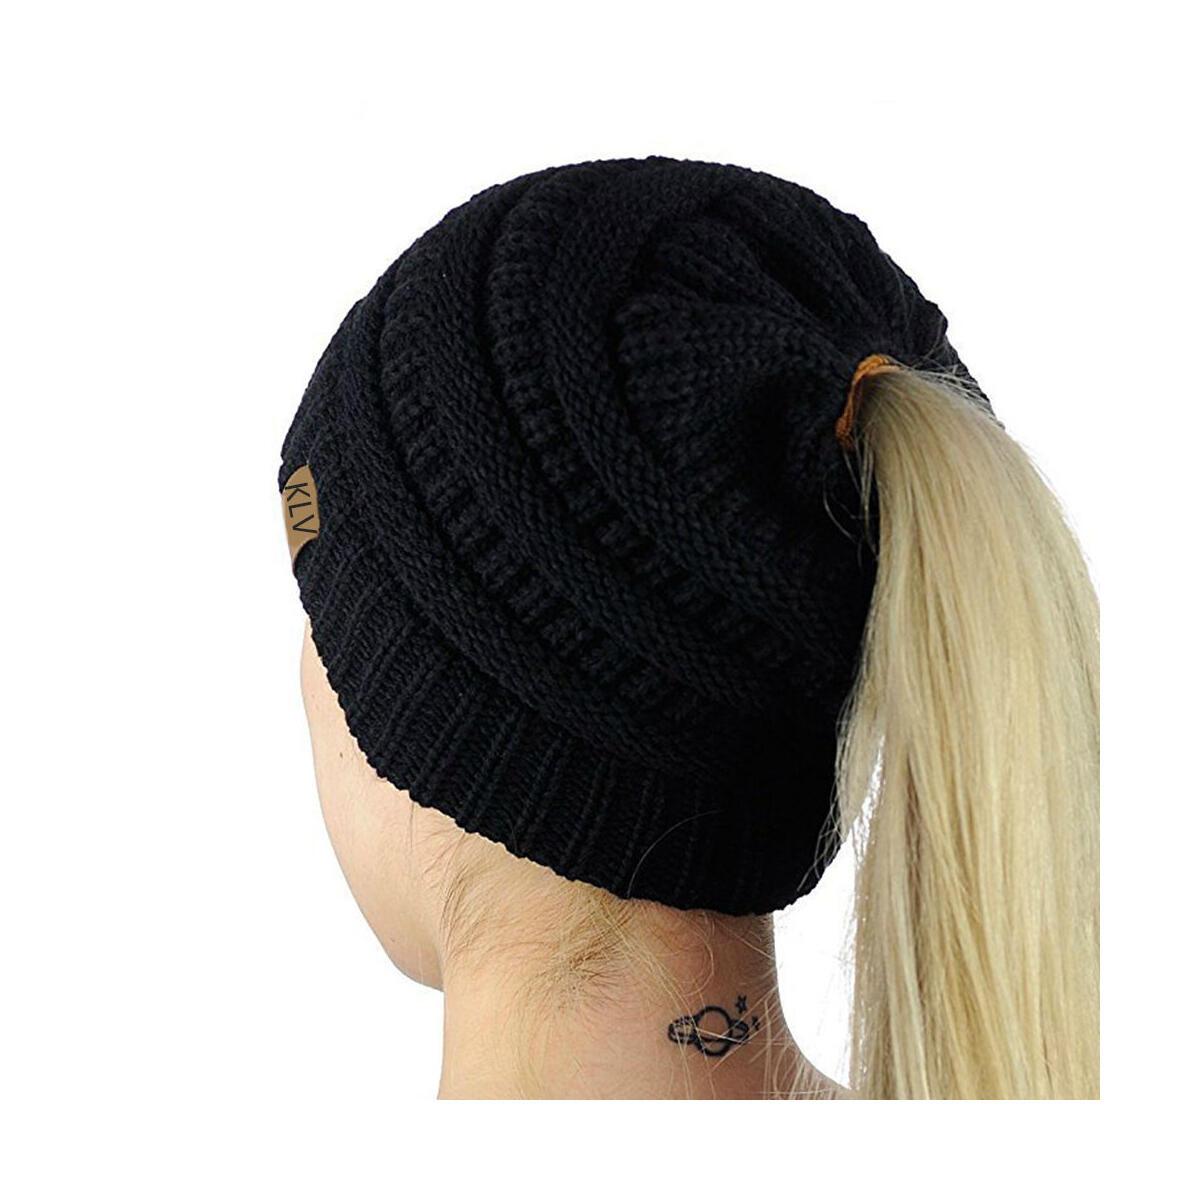 Crochet Ponytail Beanie Cap